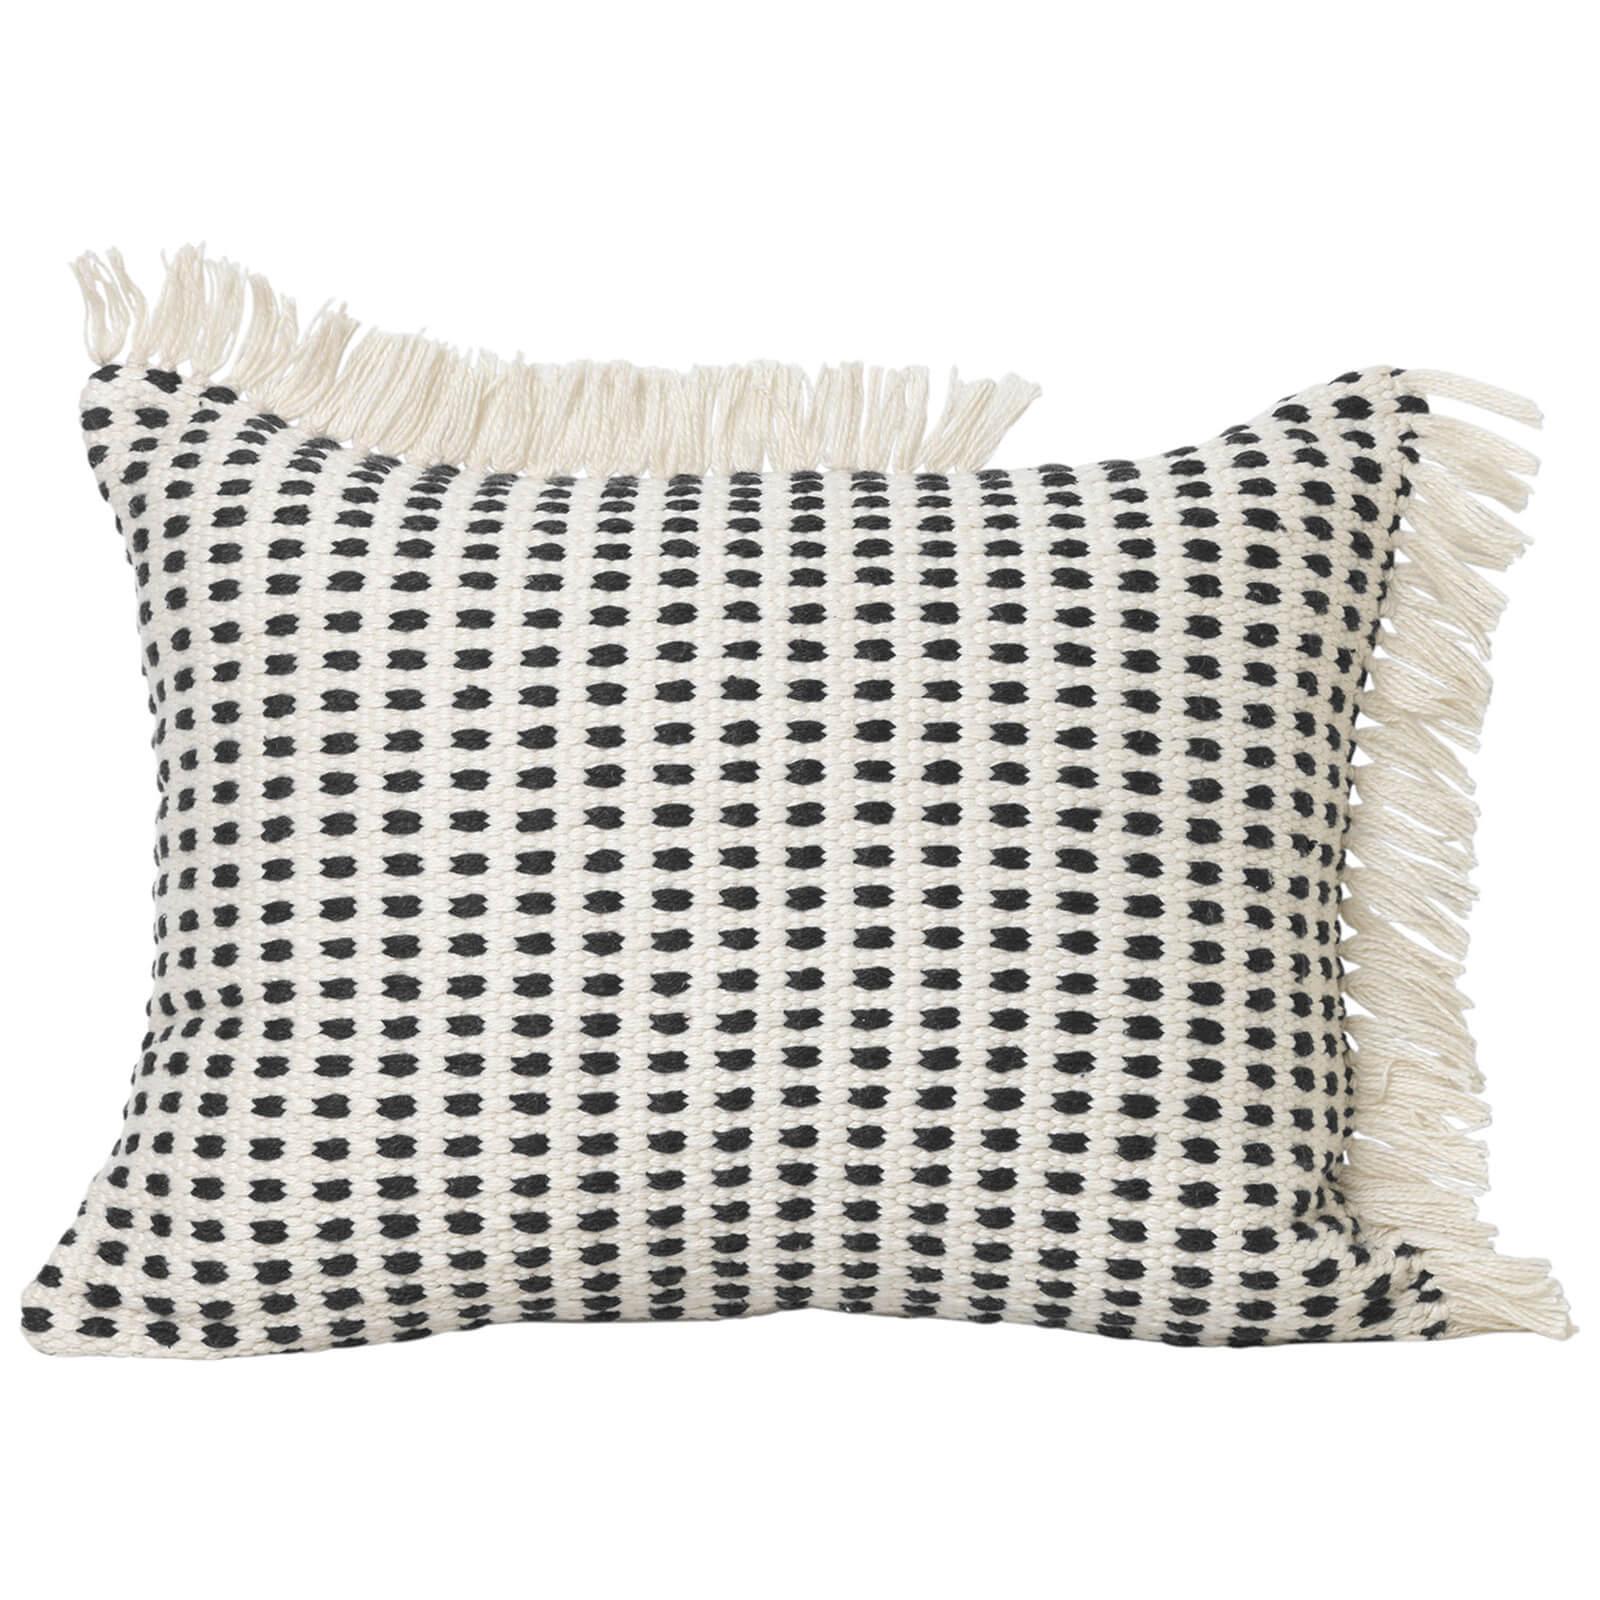 Ferm Living Way Outdoor 70cm x 50cm Cushion - White/Black